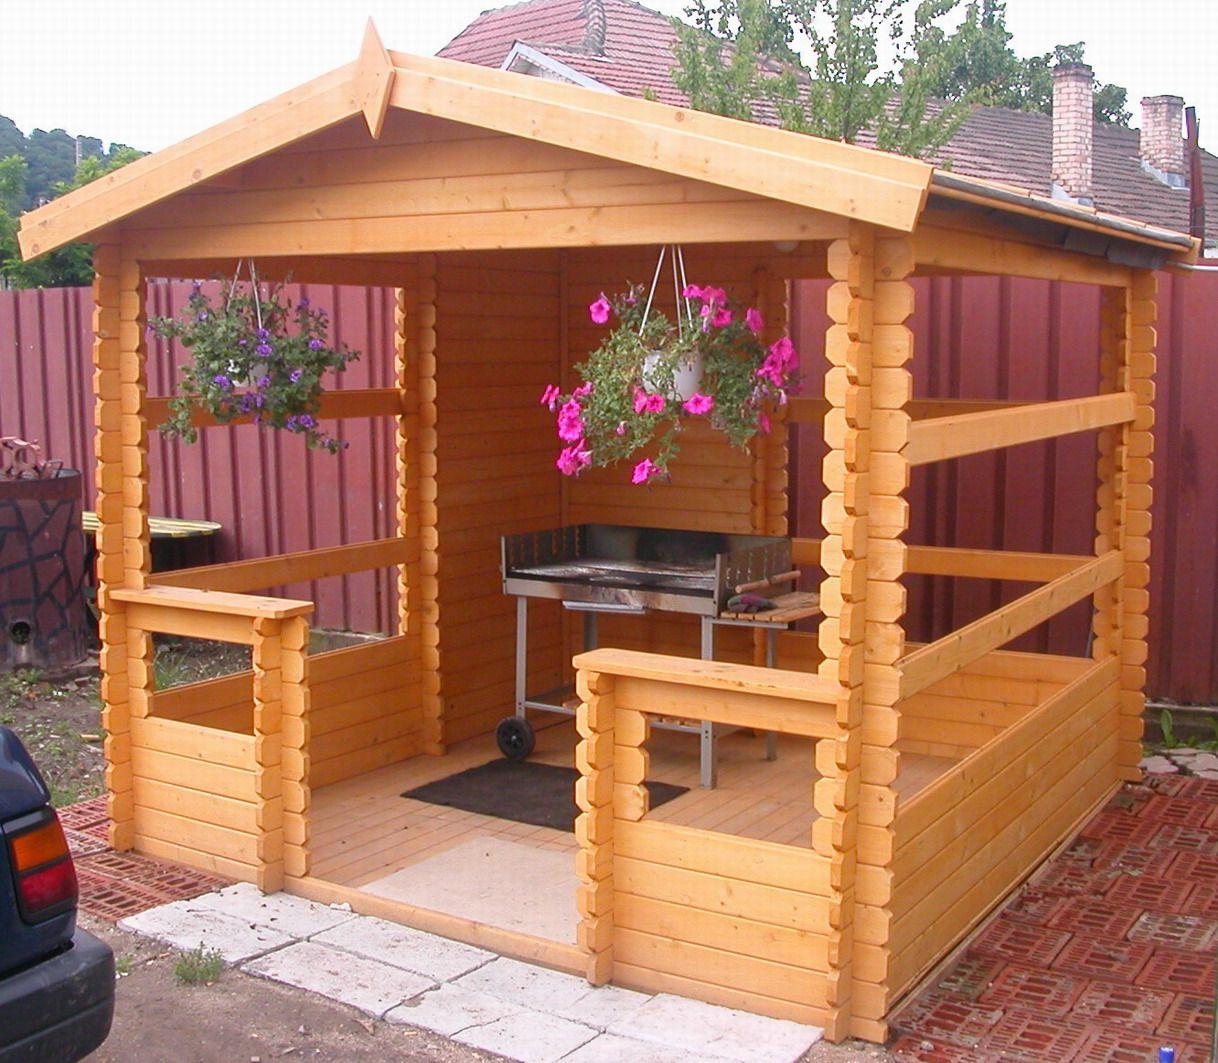 paredes de madera para jardin buscar con google ForParedes De Madera Para Jardin